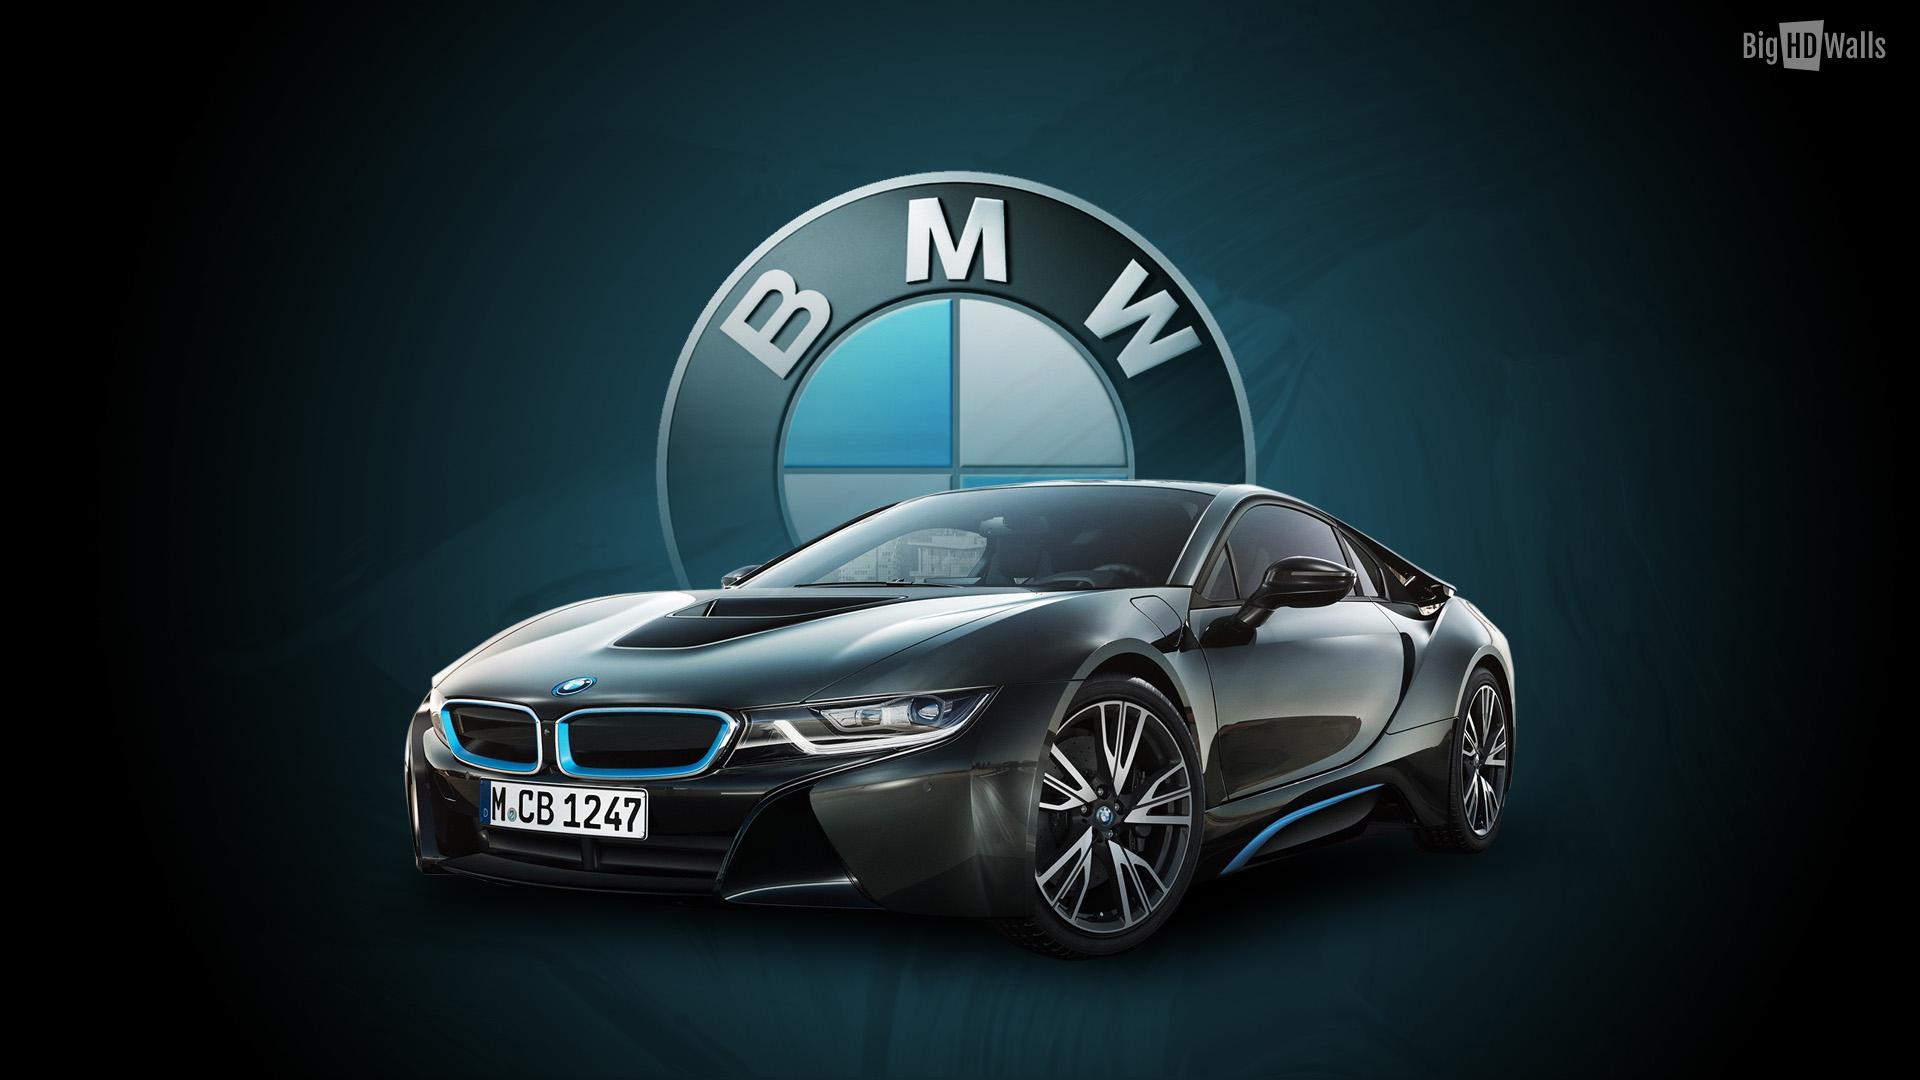 Bmw I8 Car Concept 4k Hd Desktop Wallpaper For 4k Ultra Hd: Bmw I8 Cool Car - HD Desktop Wallpapers